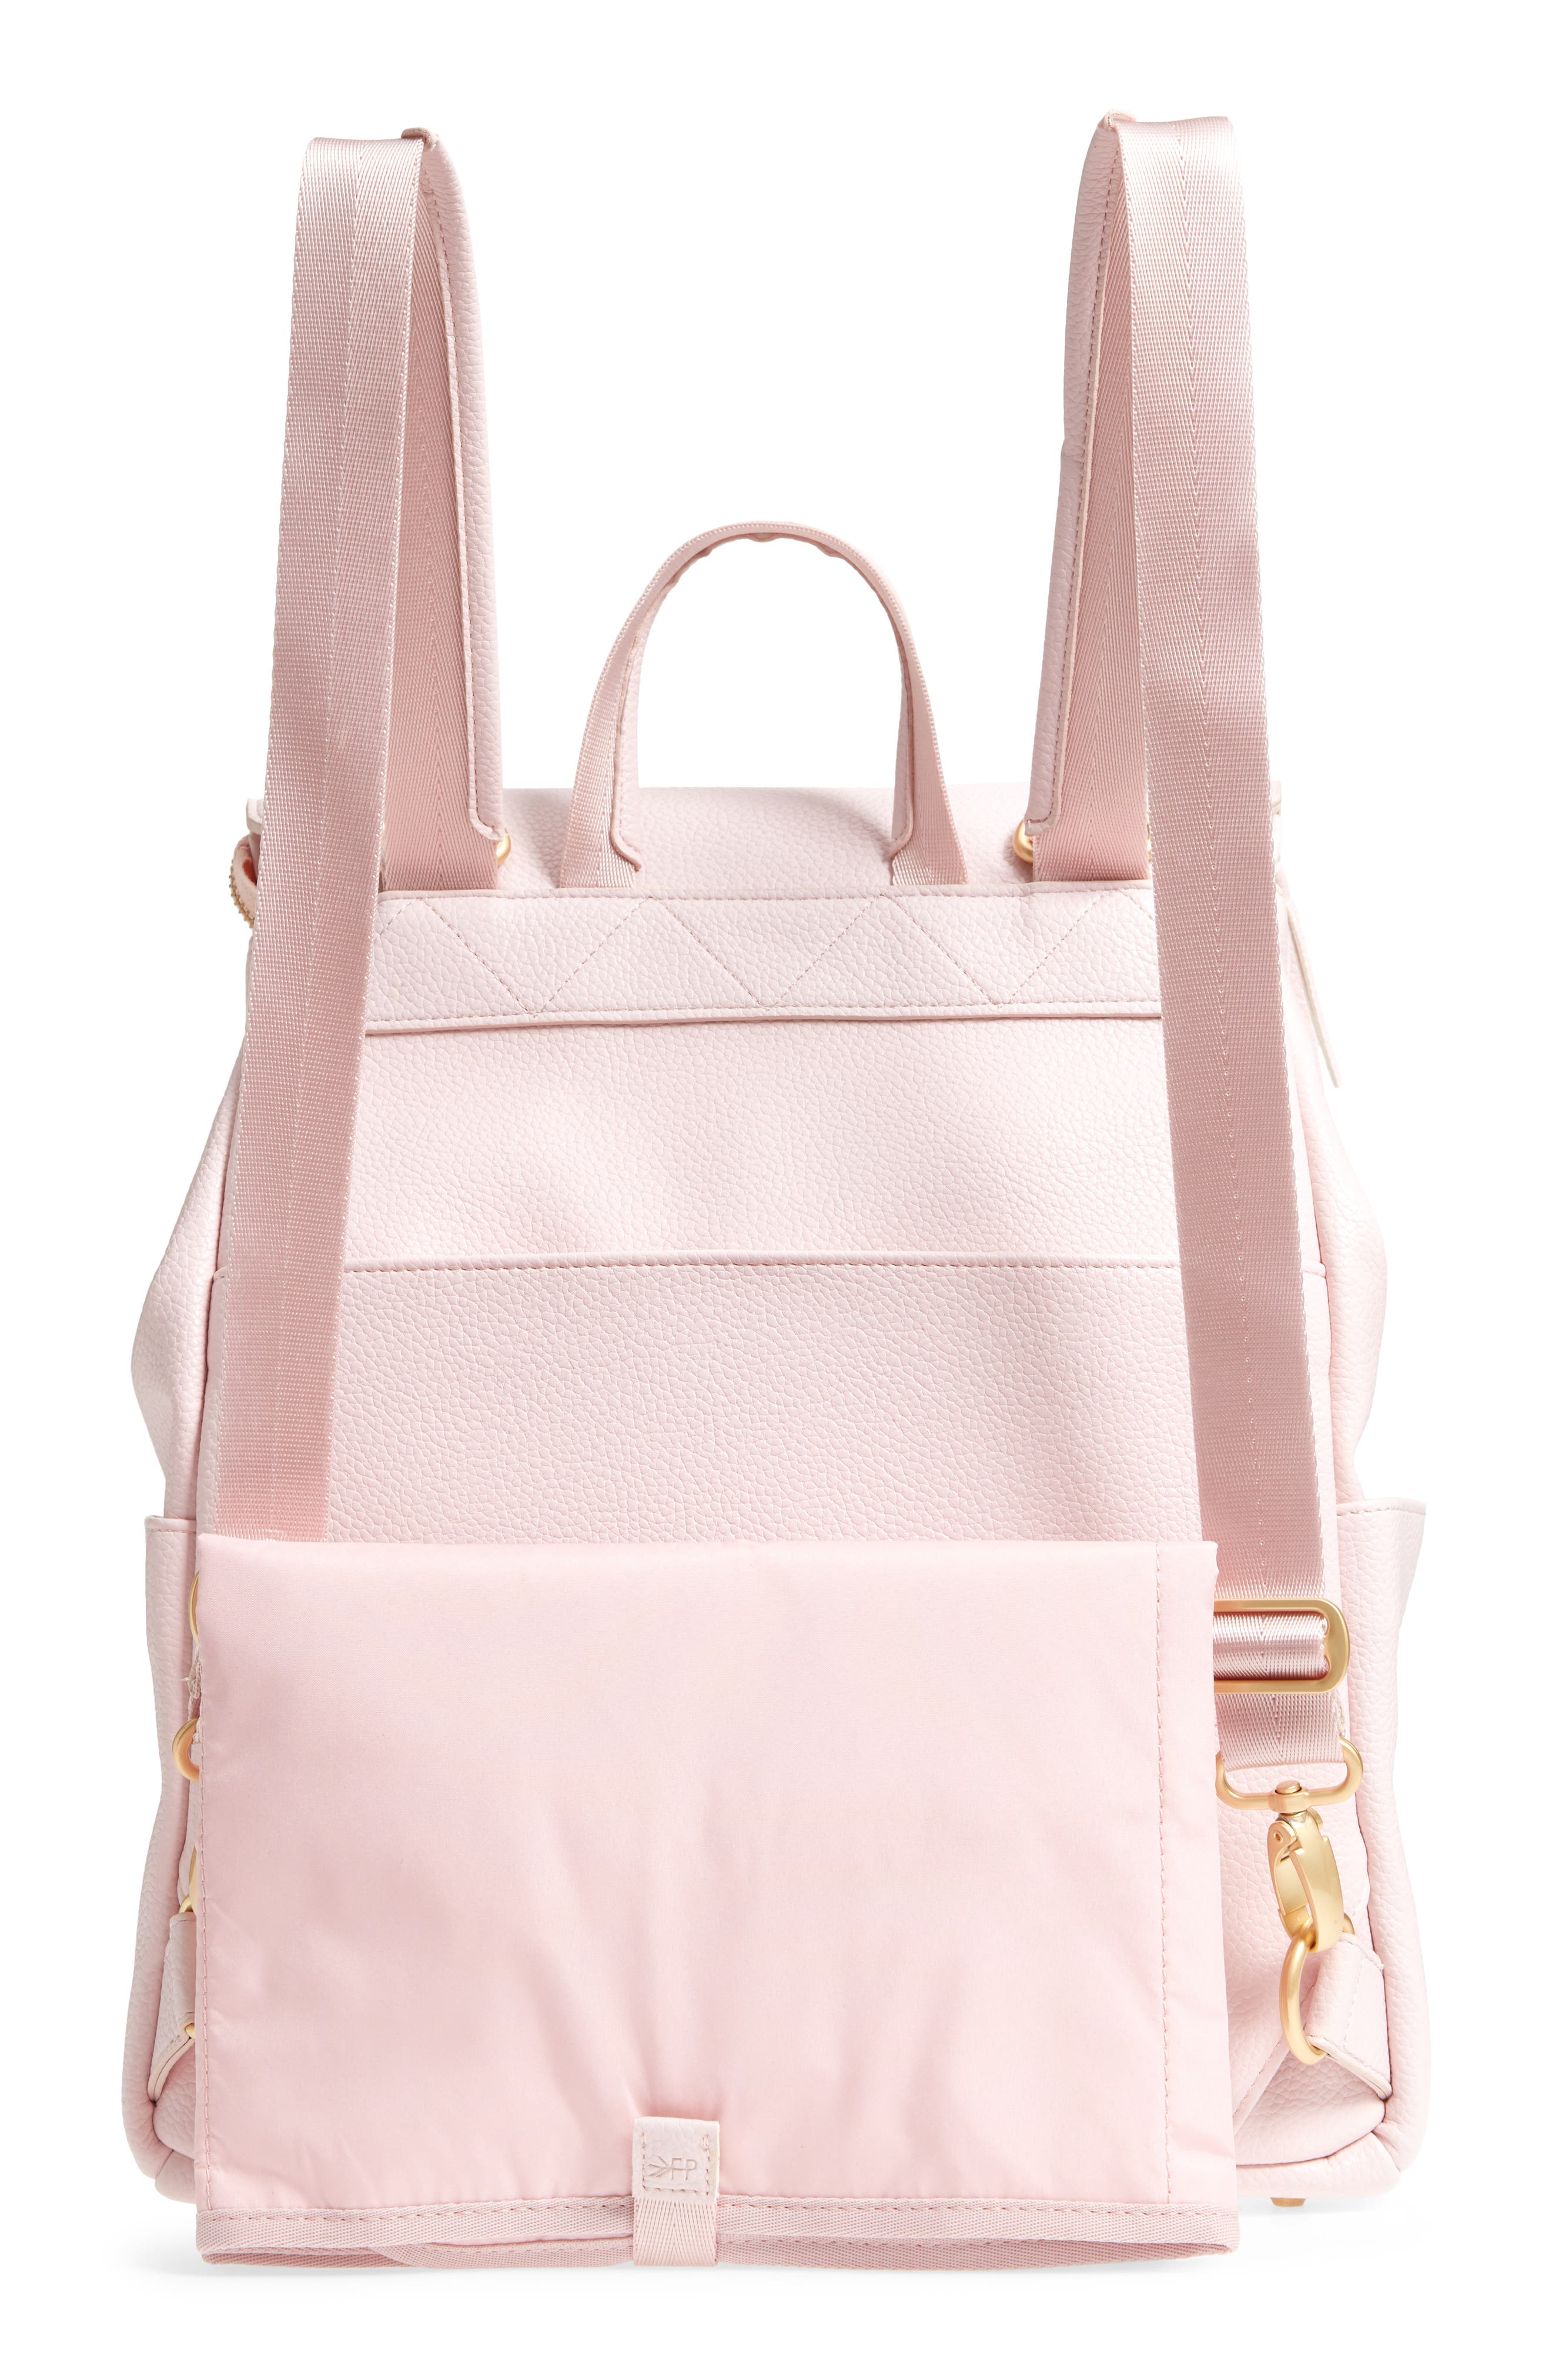 Convertible Diaper Backpack,                             Alternate thumbnail 18, color,